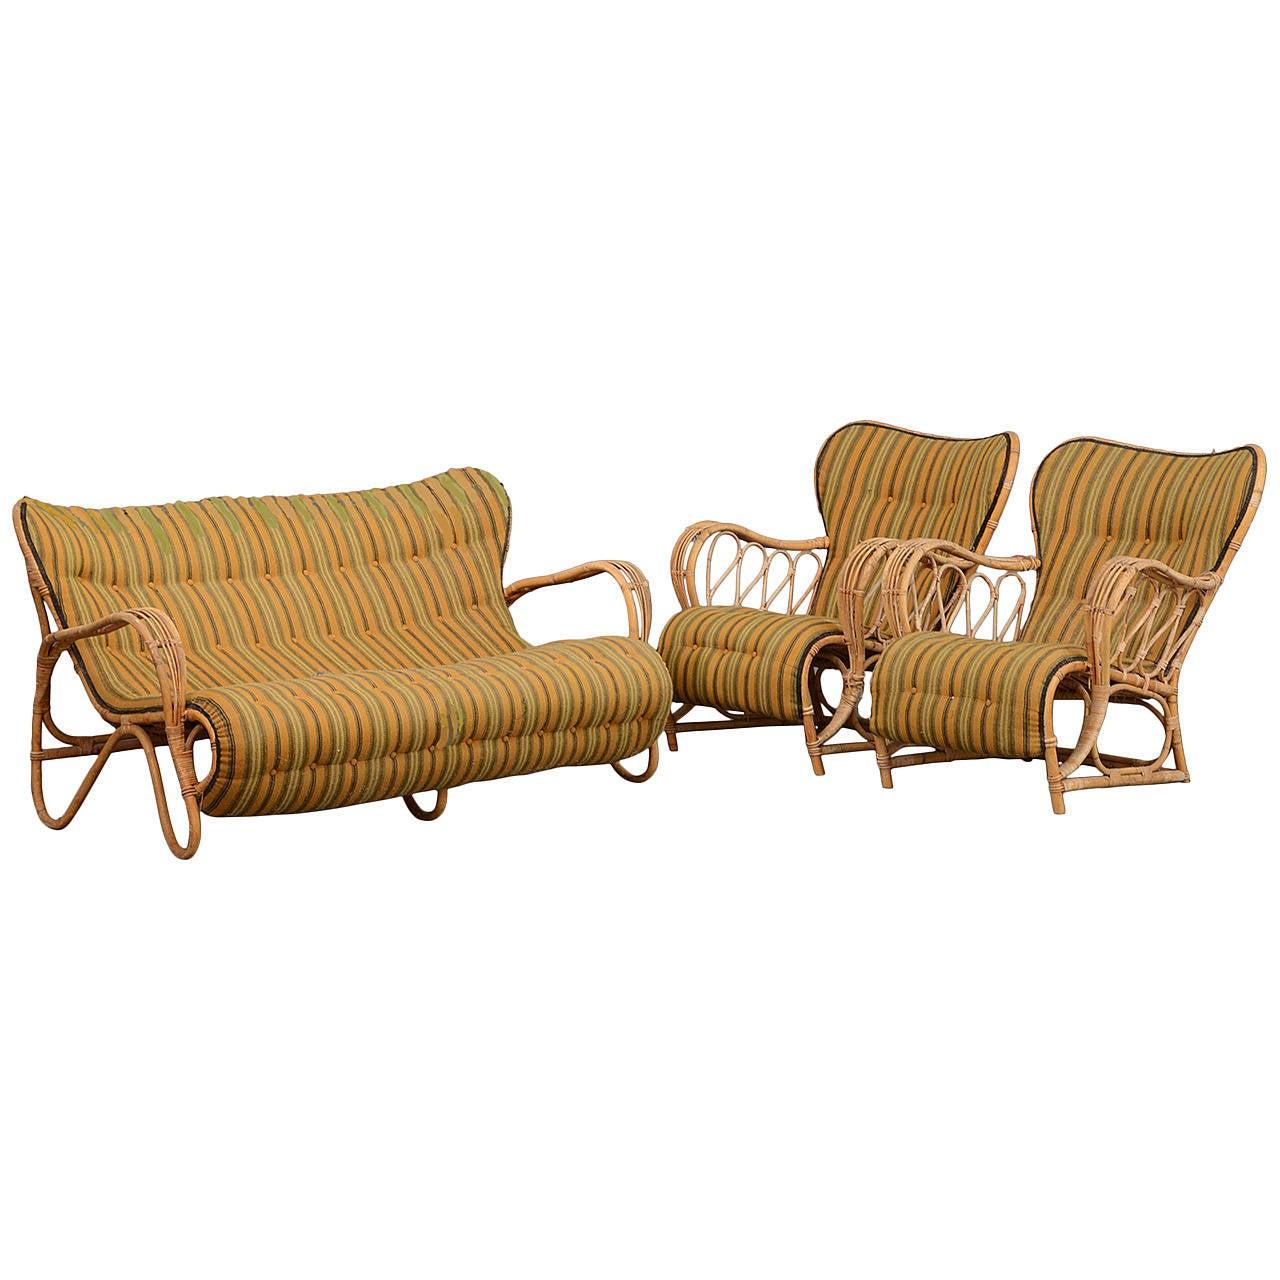 Set Of 1940s 1950s Danish Rattan Sofa And Armchairs At 1stdibs